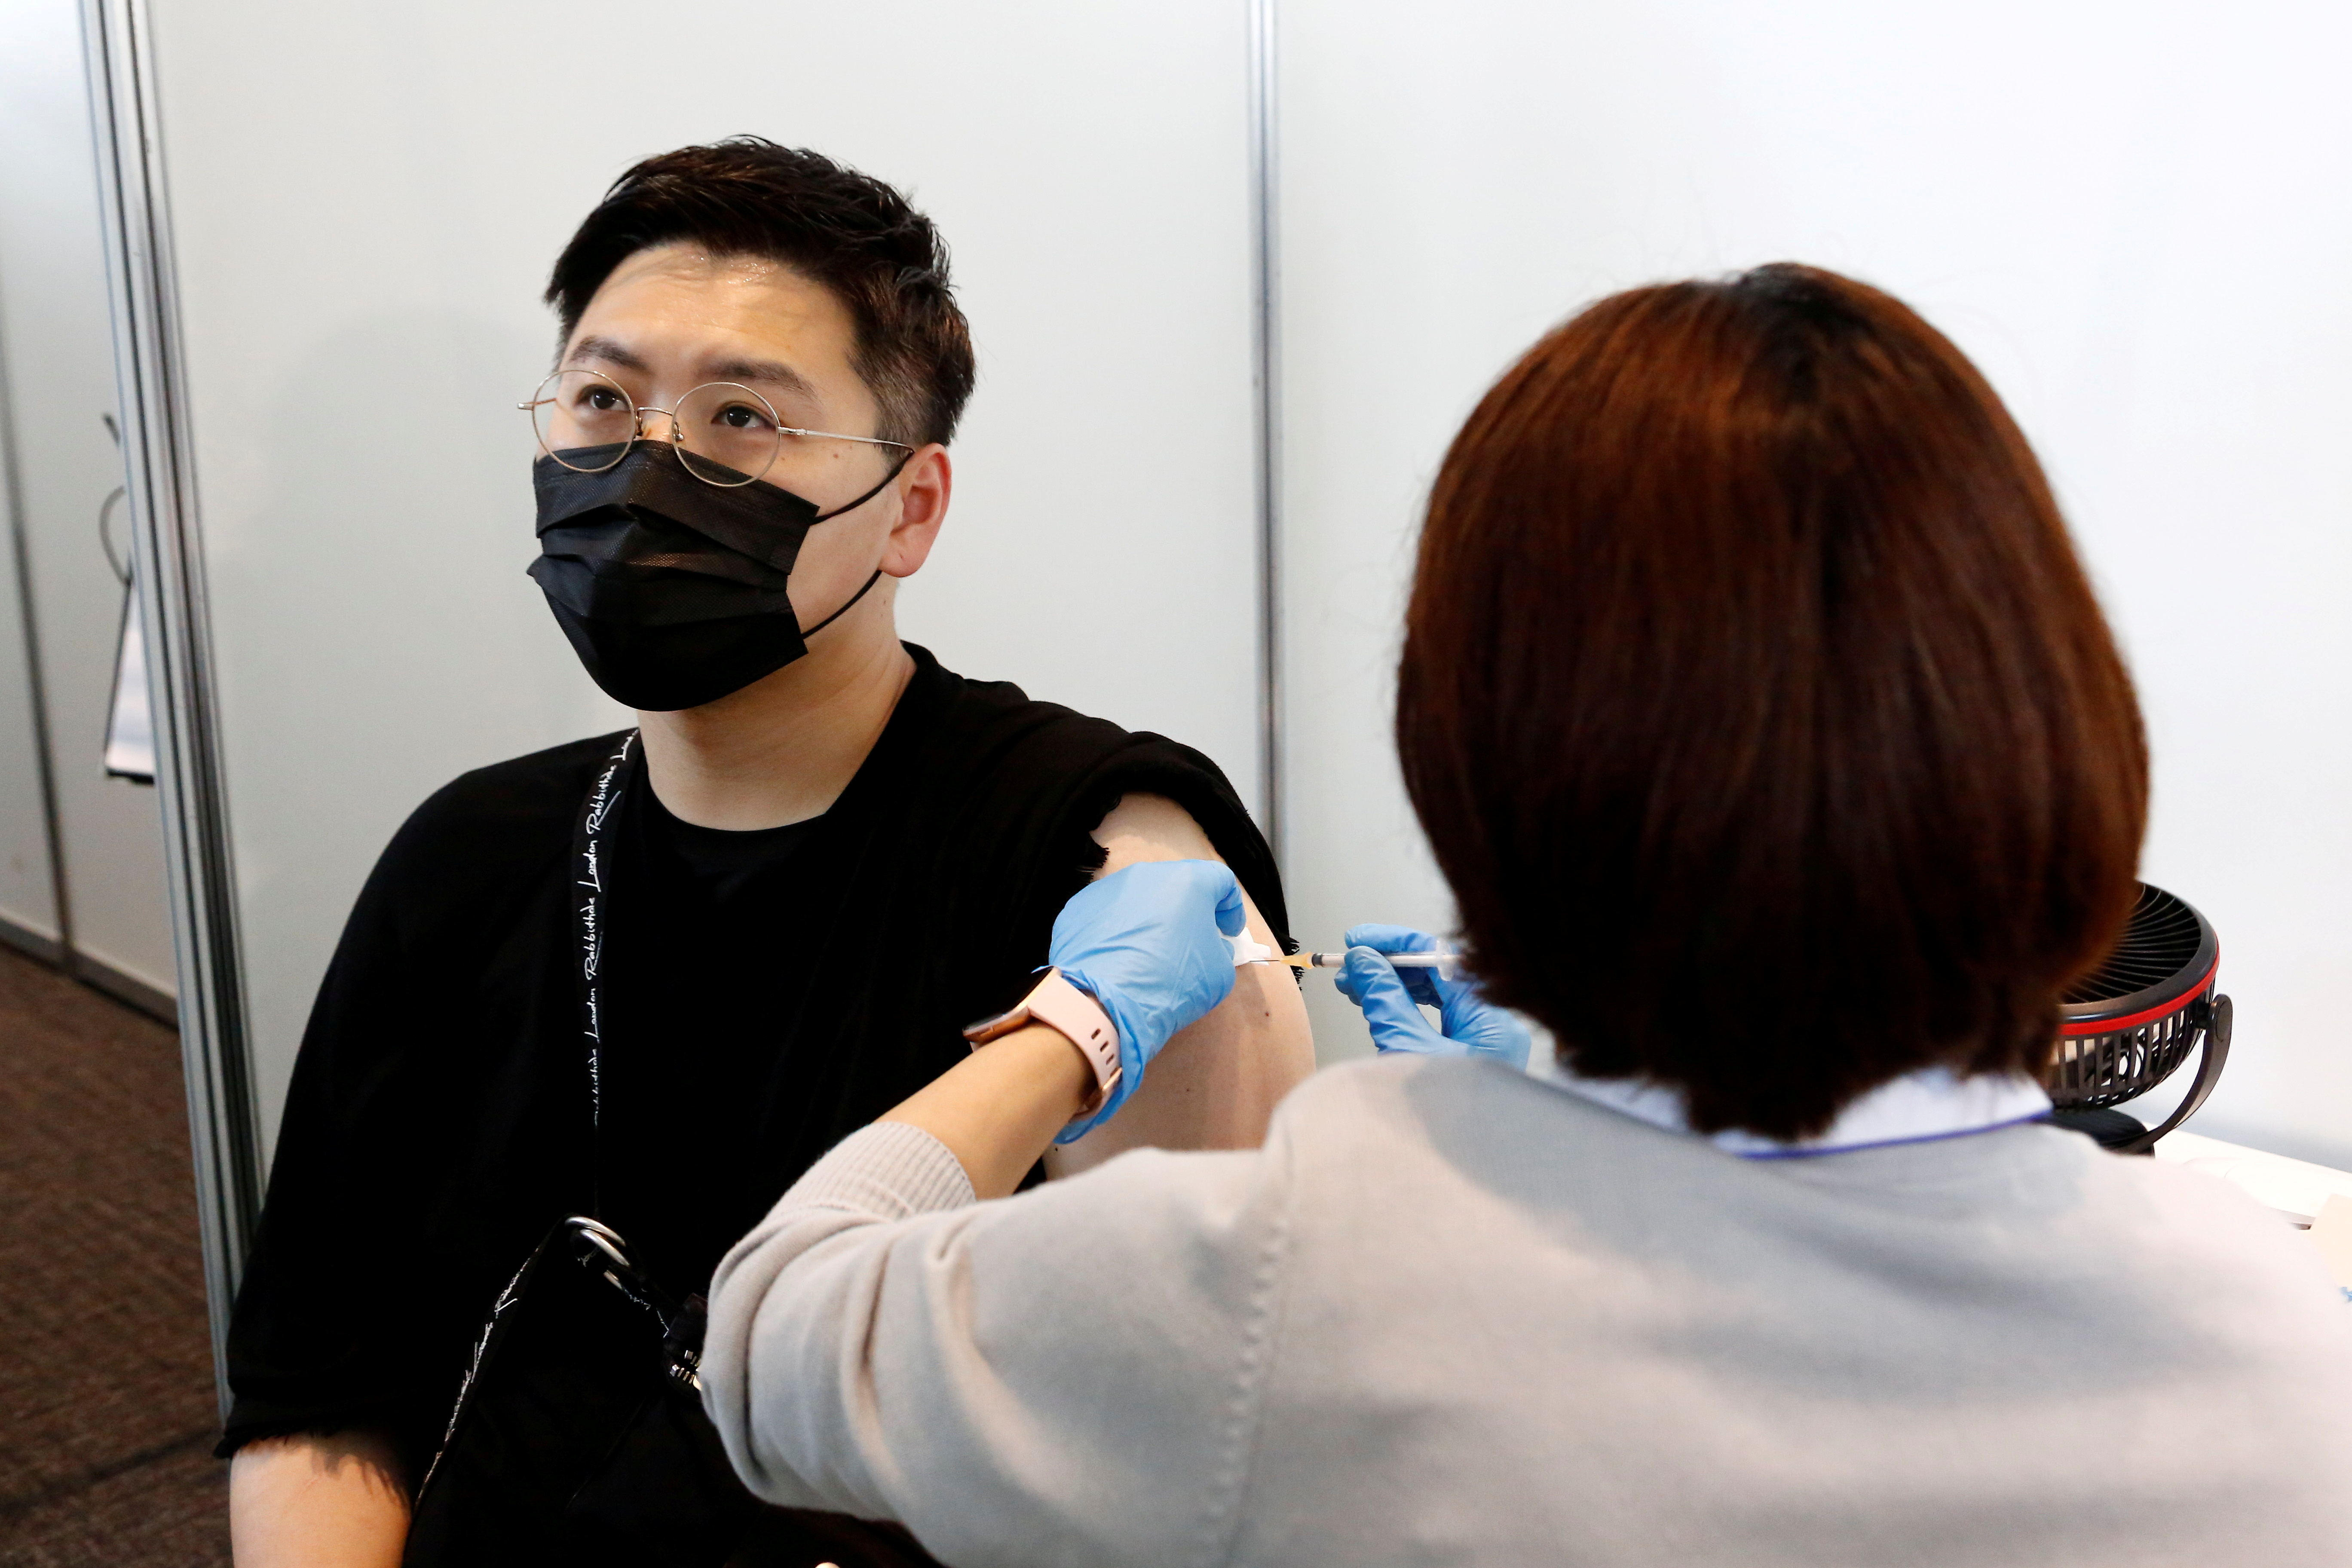 A man receives the Moderna coronavirus vaccine at the Tokyo Metropolitan Government building in Tokyo, Japan June 25, 2021. Rodrigo Reyes Marin/Pool via REUTERS